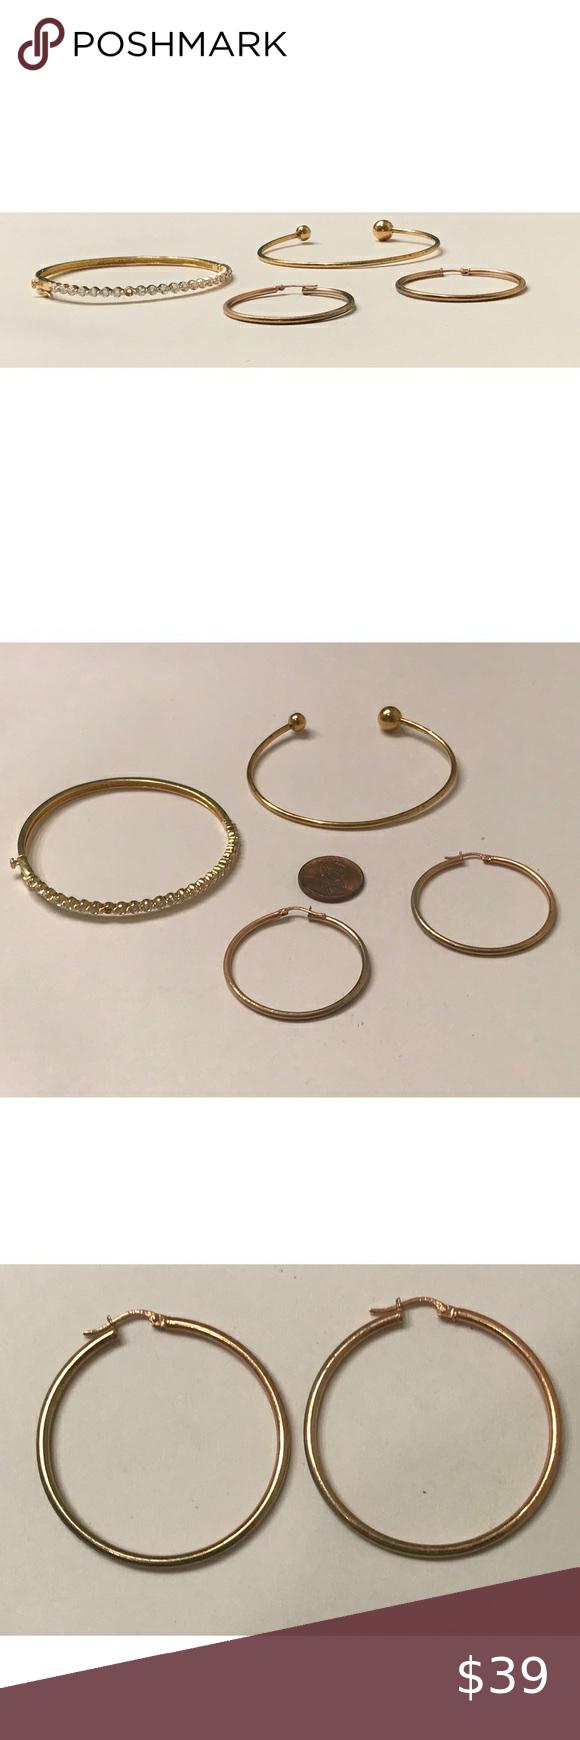 Does Gold Vermeil Tarnish : vermeil, tarnish, Sterling, Vermeil, Earring, Bracelets, Earrings,, Vermeil,, Hinged, Bangle